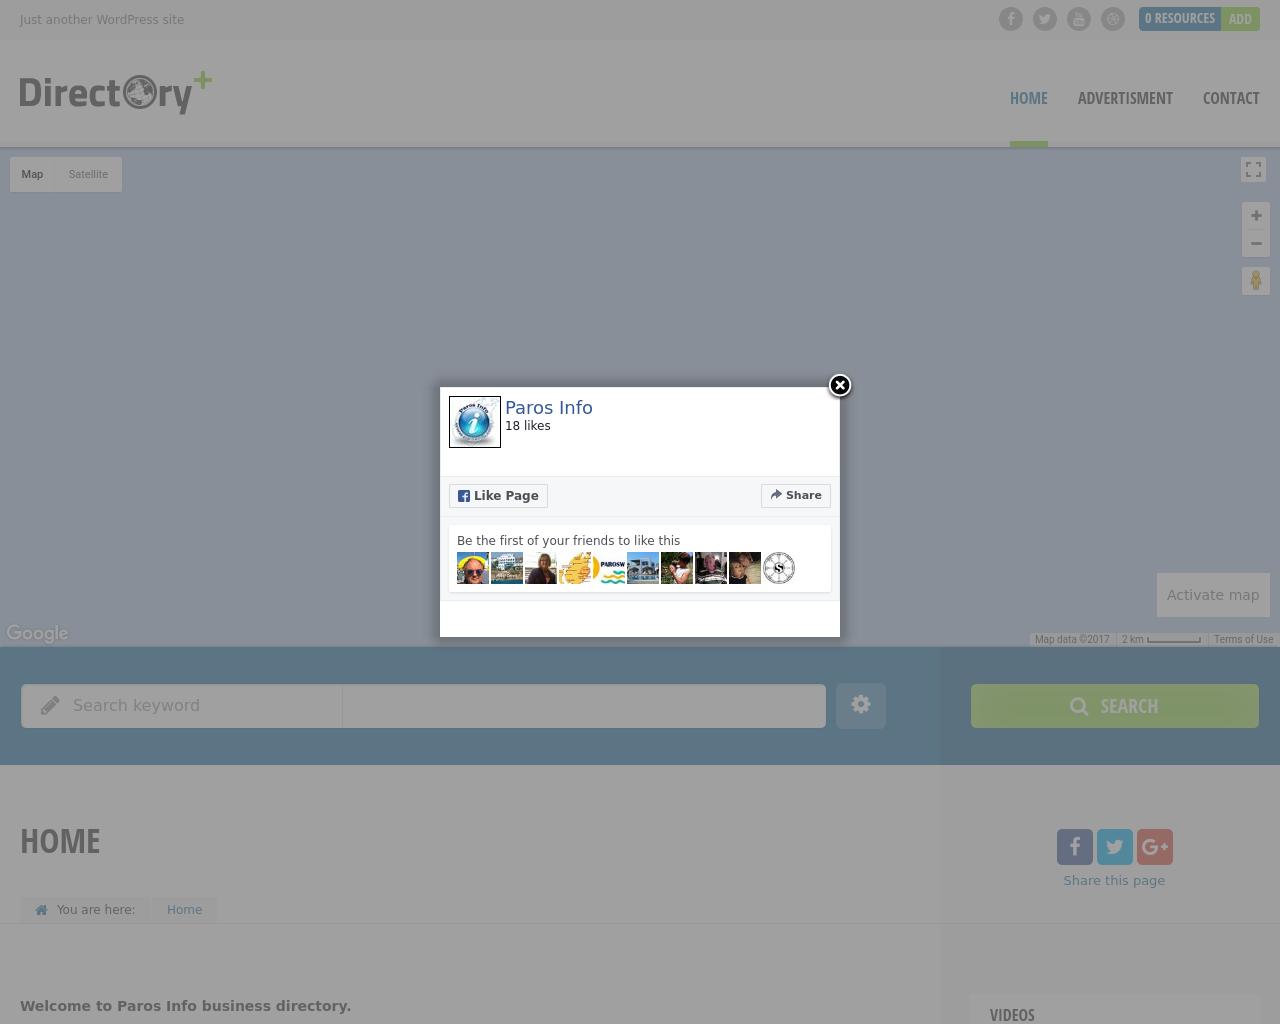 Paros-Info-Web-Directory-Advertising-Reviews-Pricing